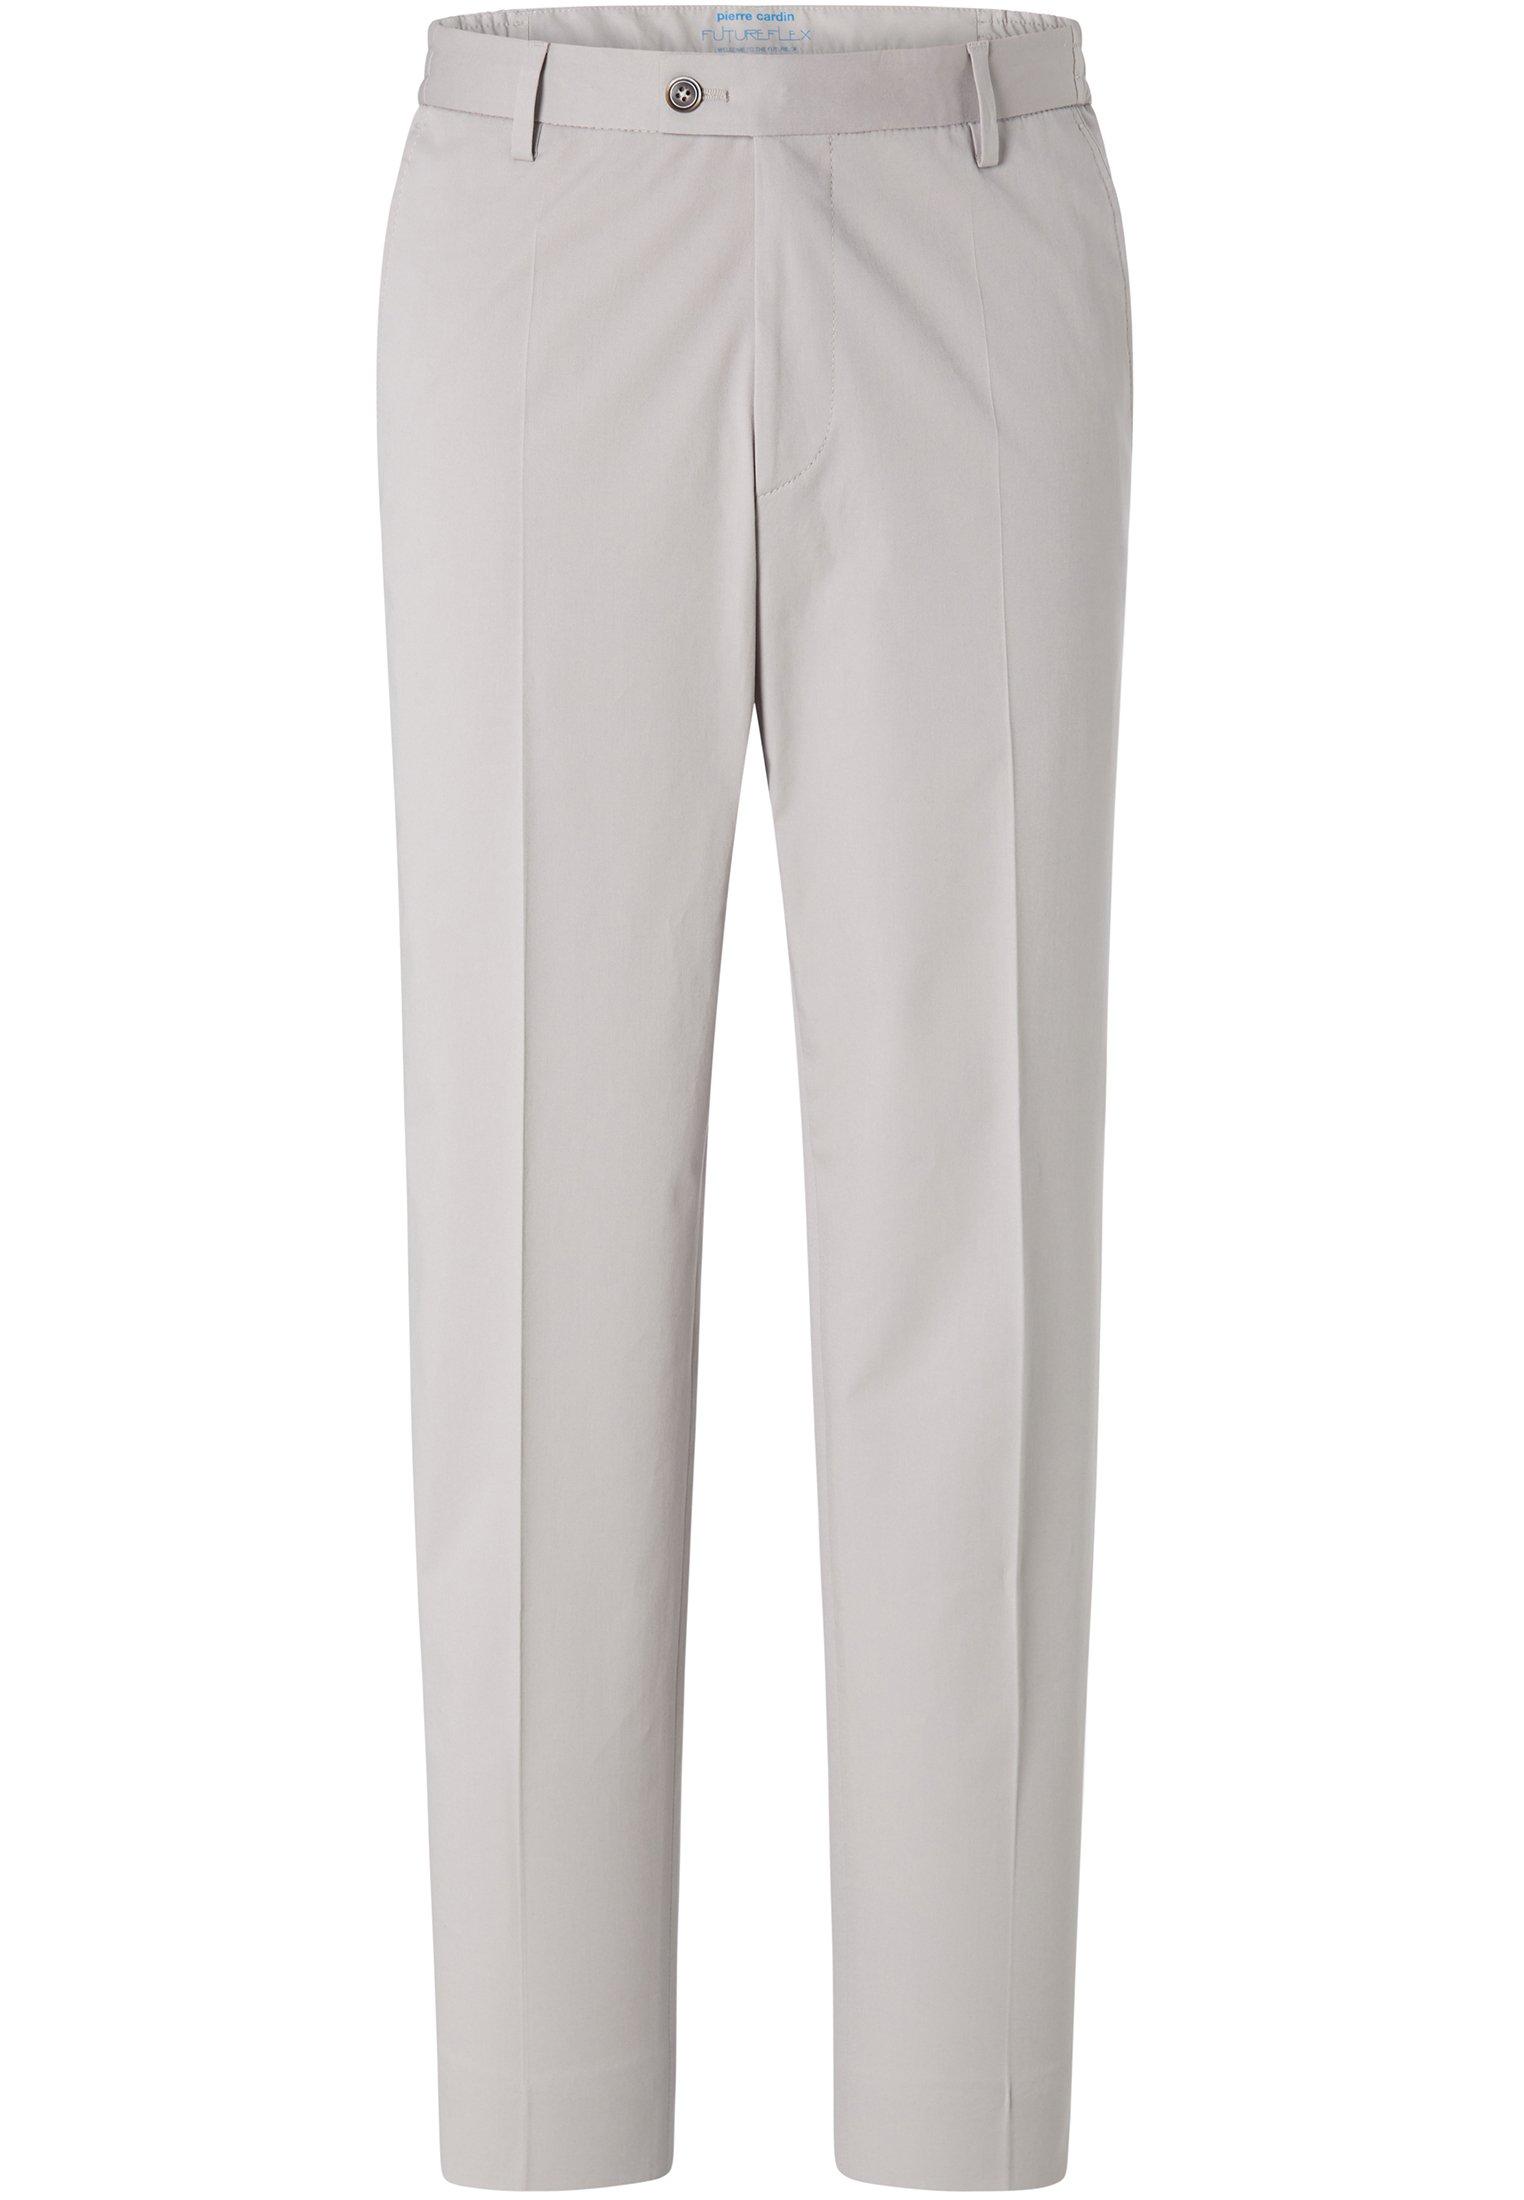 Pierre Cardin BAUKASTEN HOSE FUTUREFLEX RICH - Pantalon de costume - beige